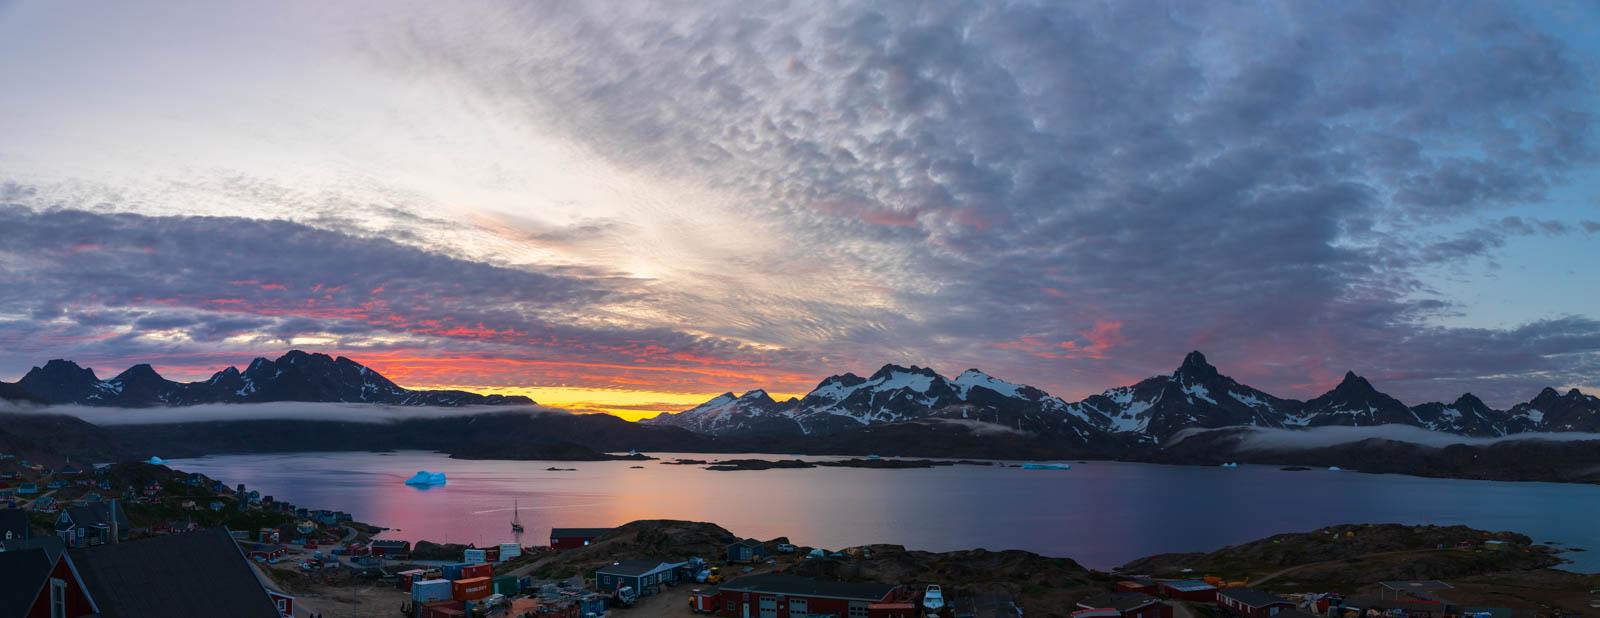 Ostgrönland, Grönland, Panorama, Tasiilaq, Mitternachtssonne